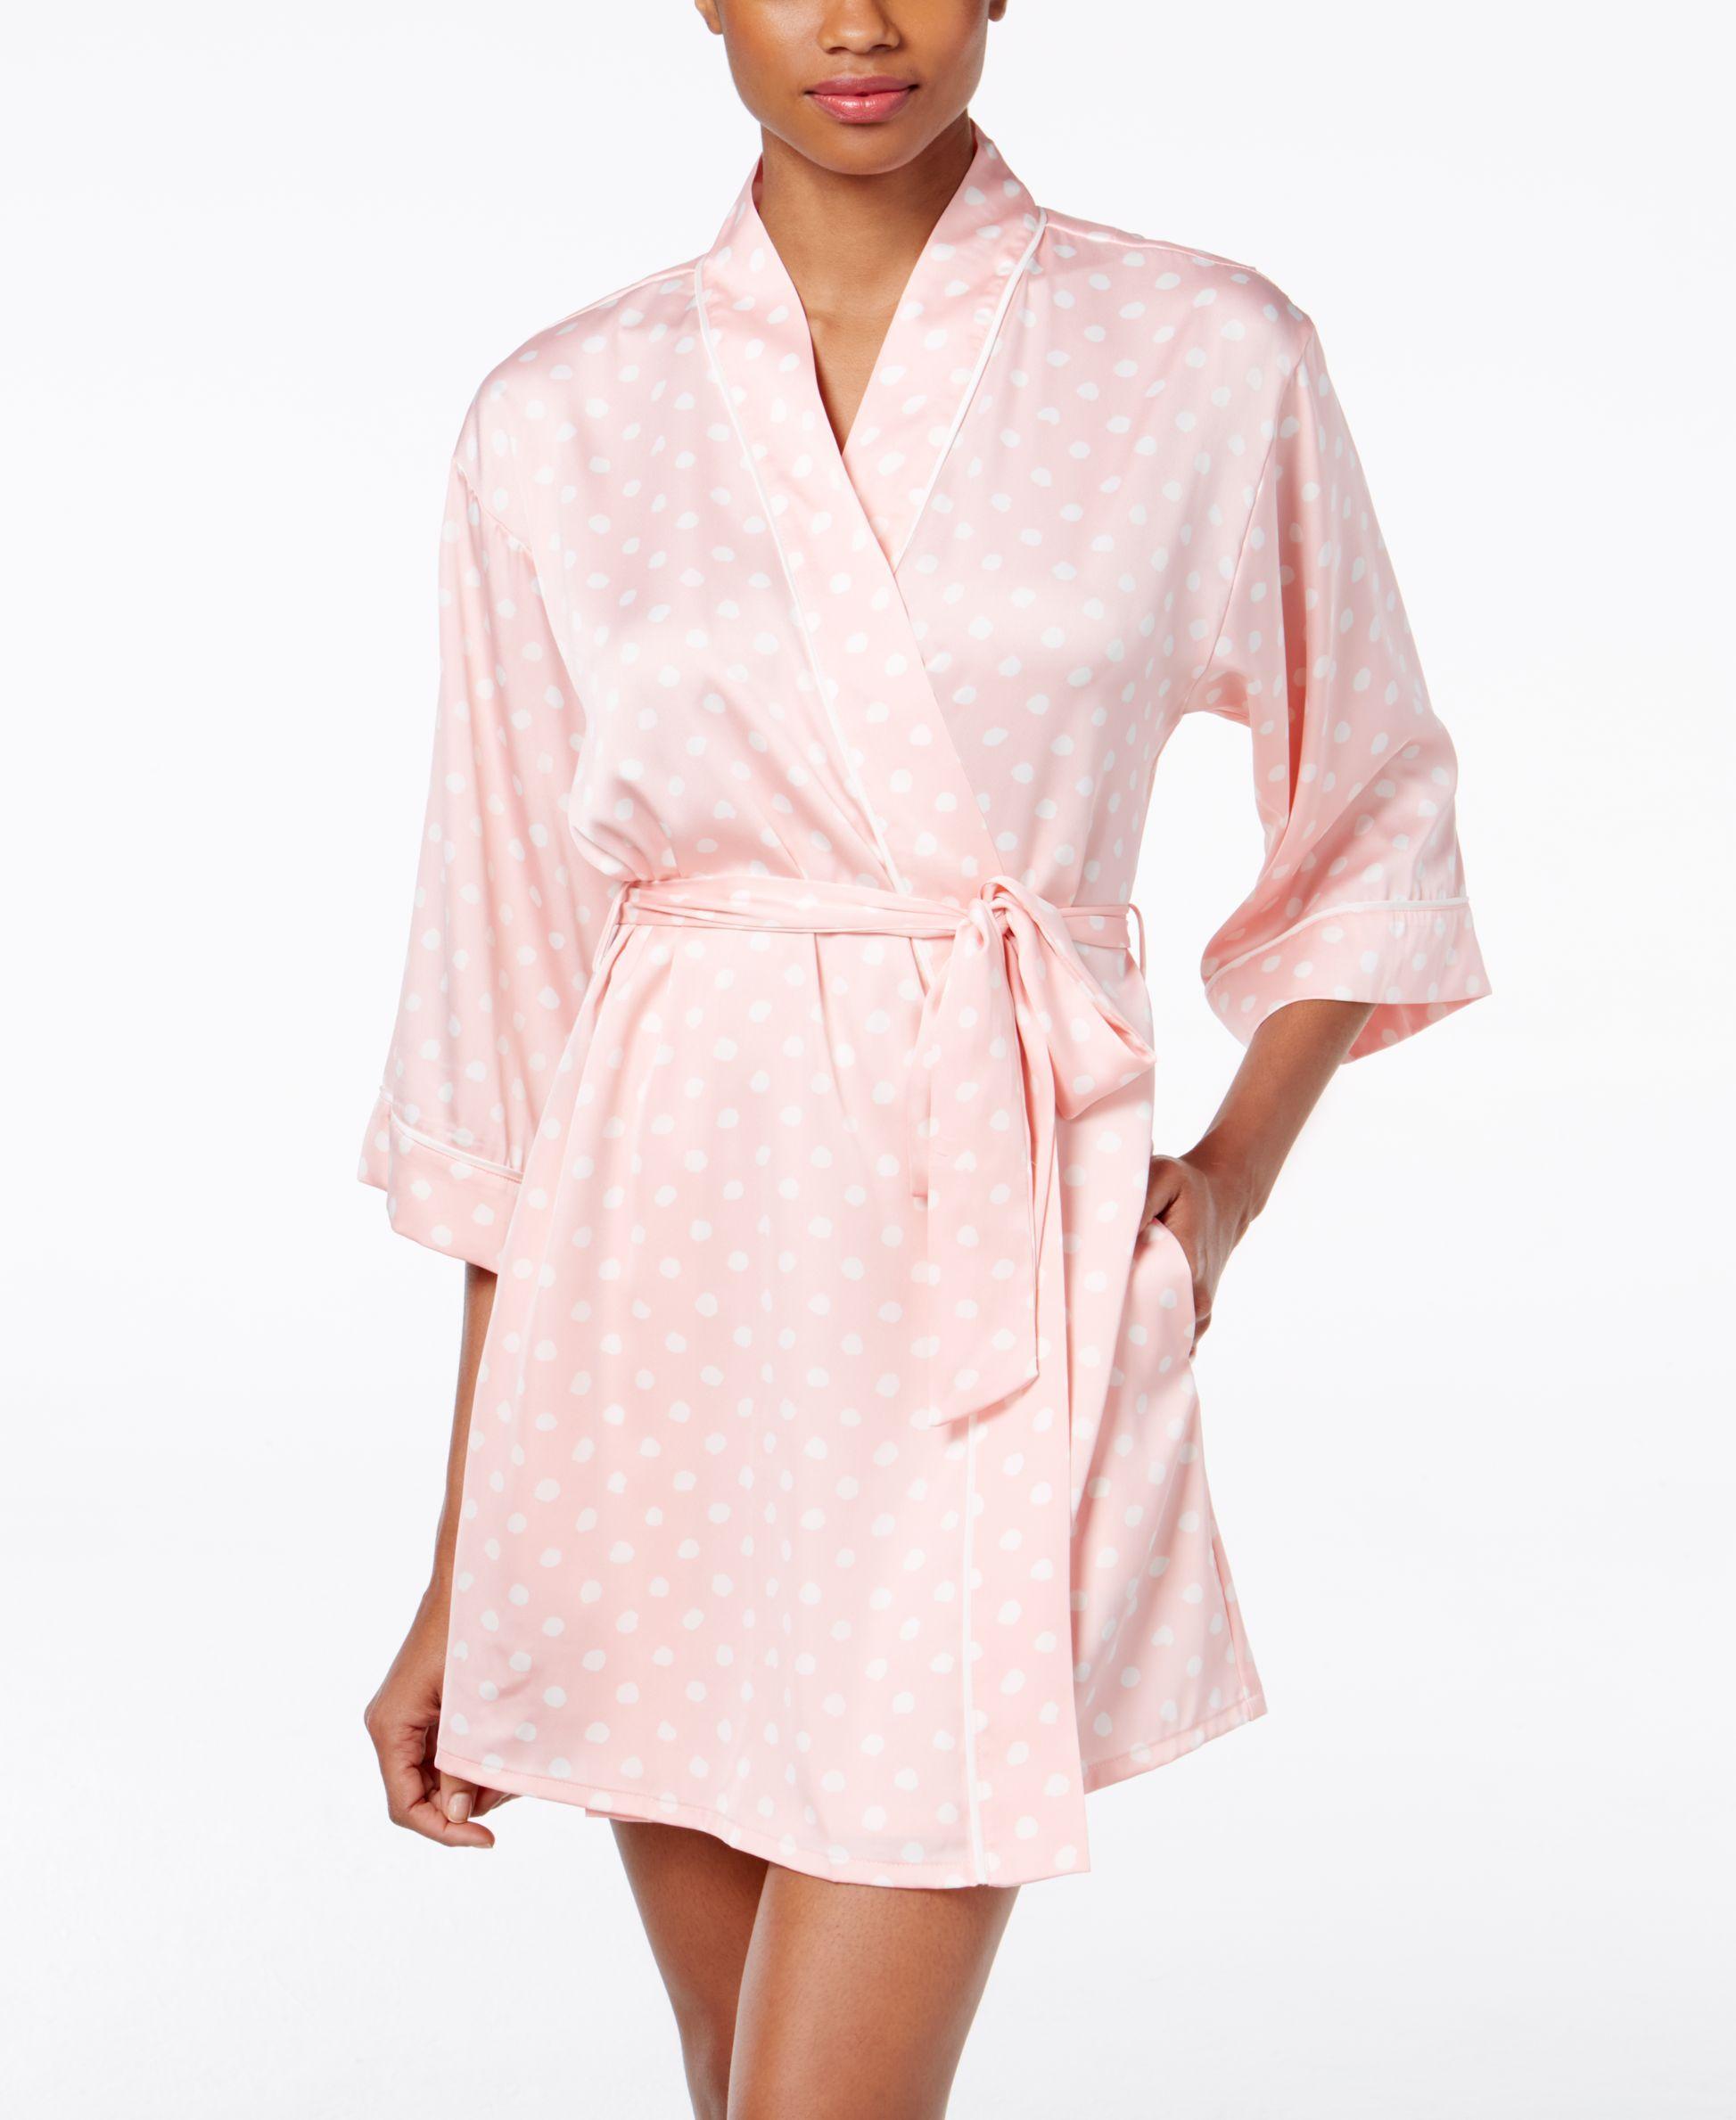 1ecea4bd17 kate spade new york Luxe Printed Robe - All Pajamas